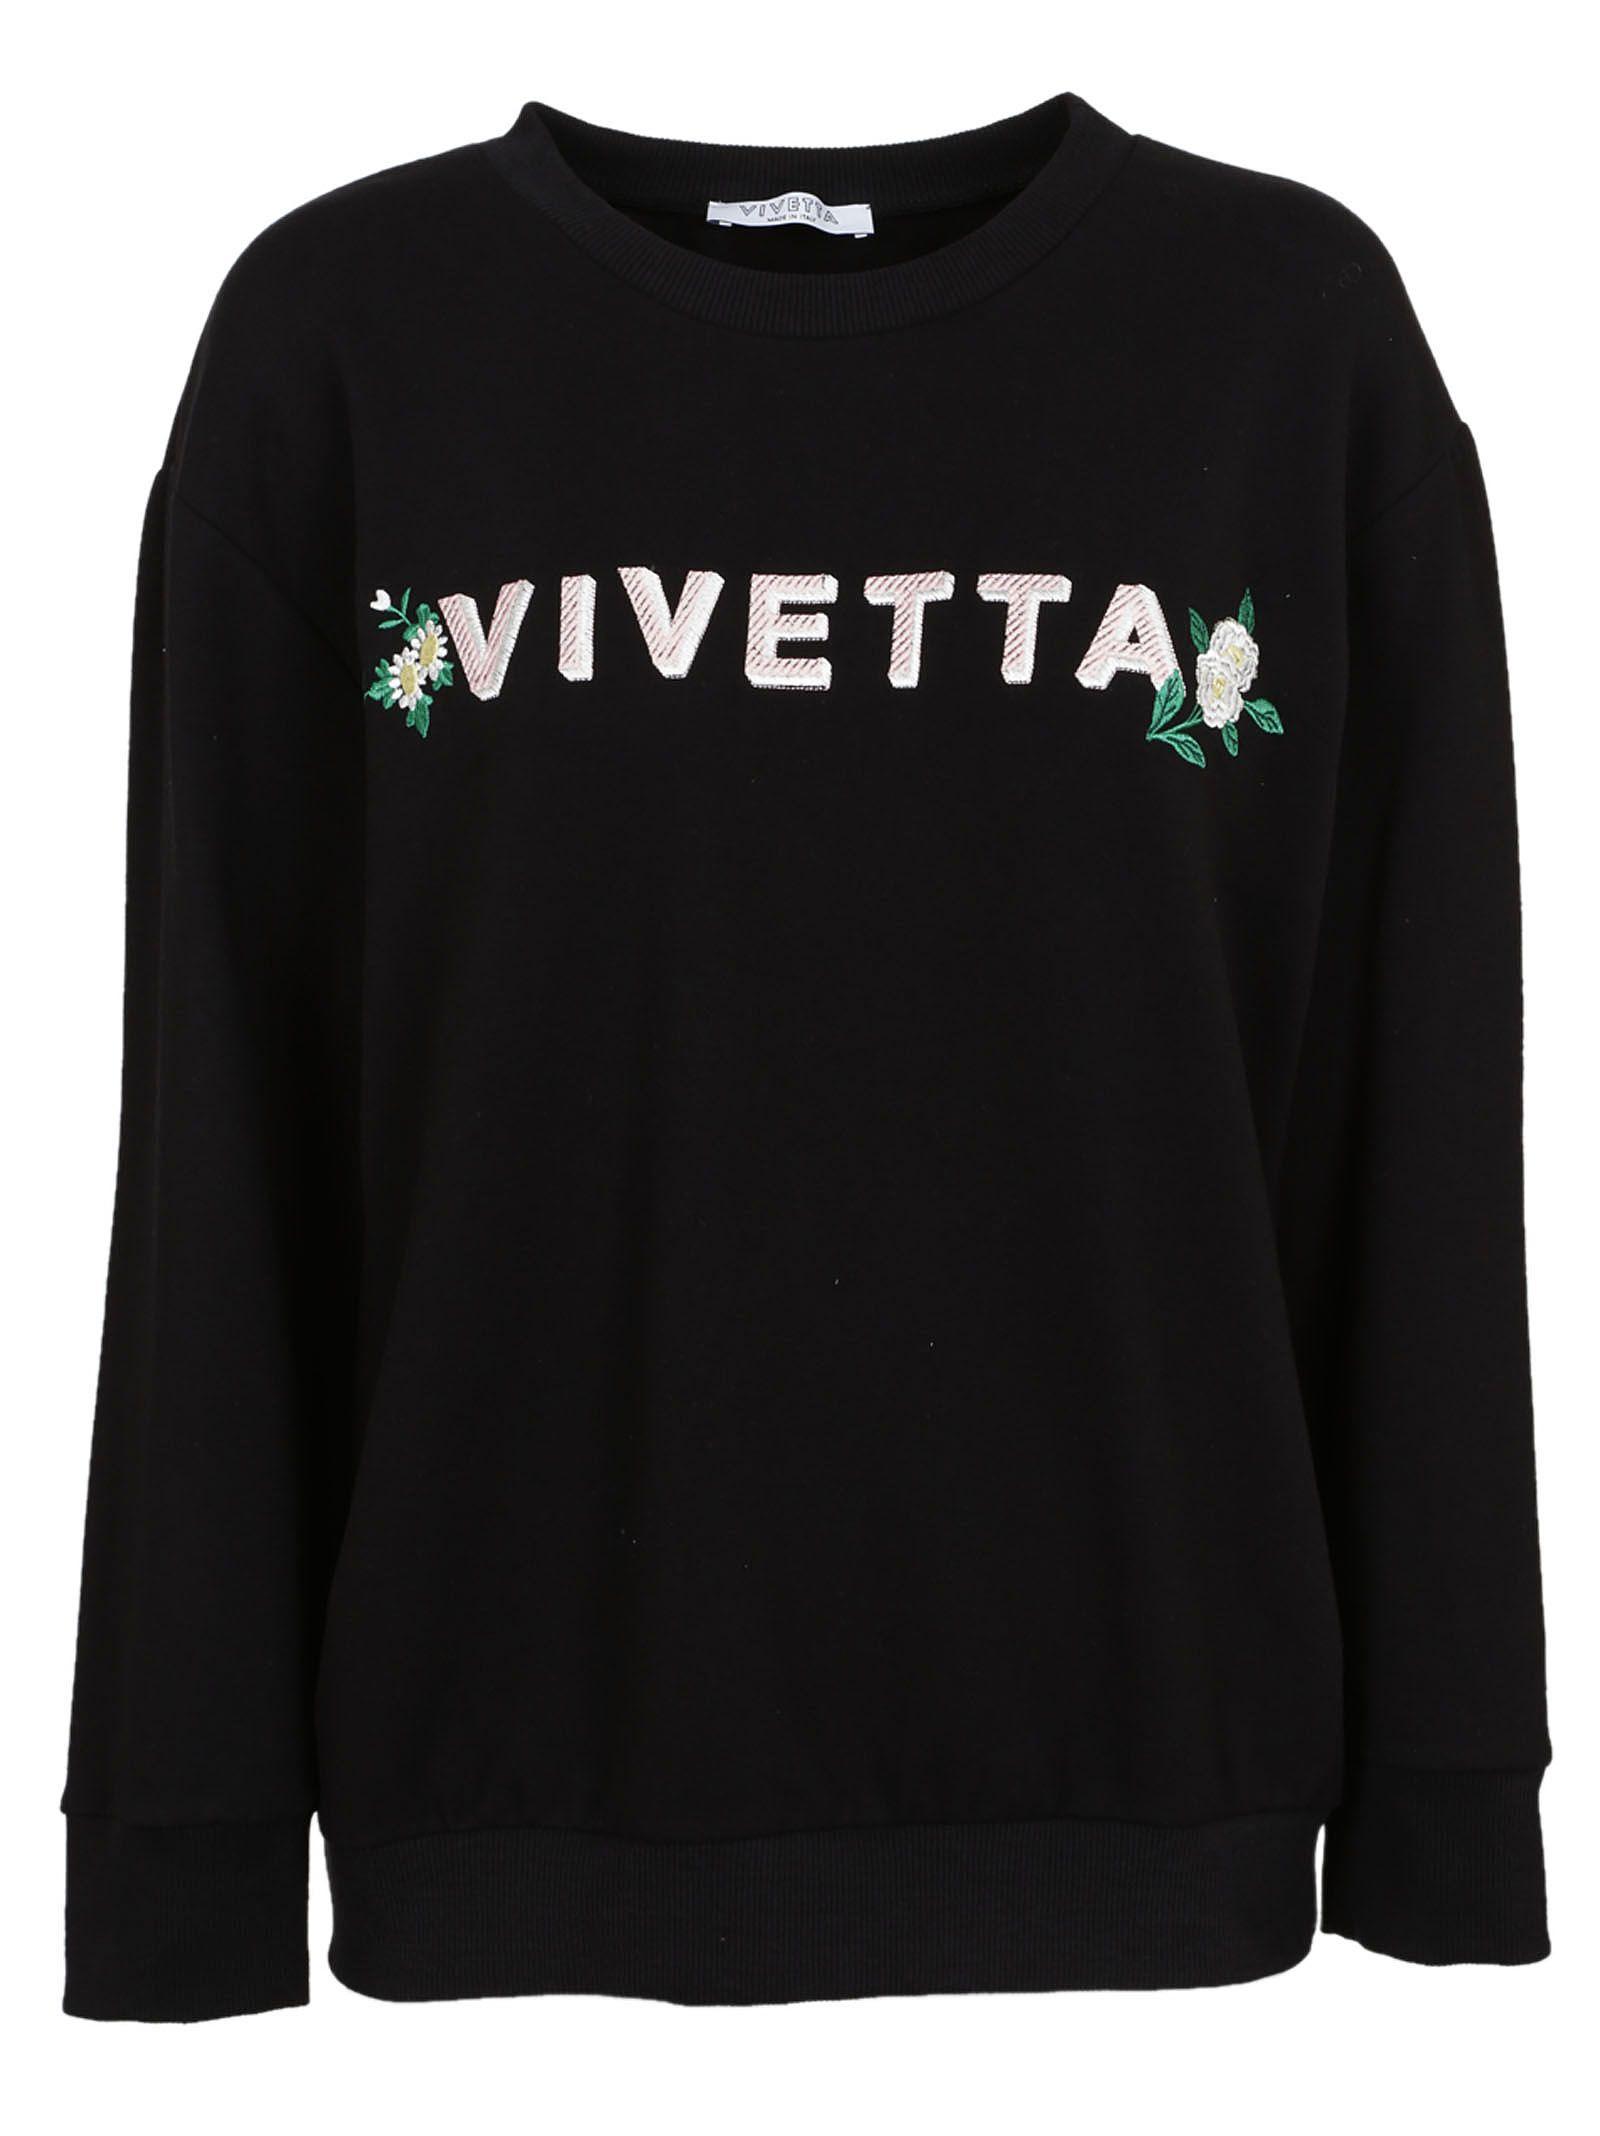 Vivetta Embroidery Sweatshirt